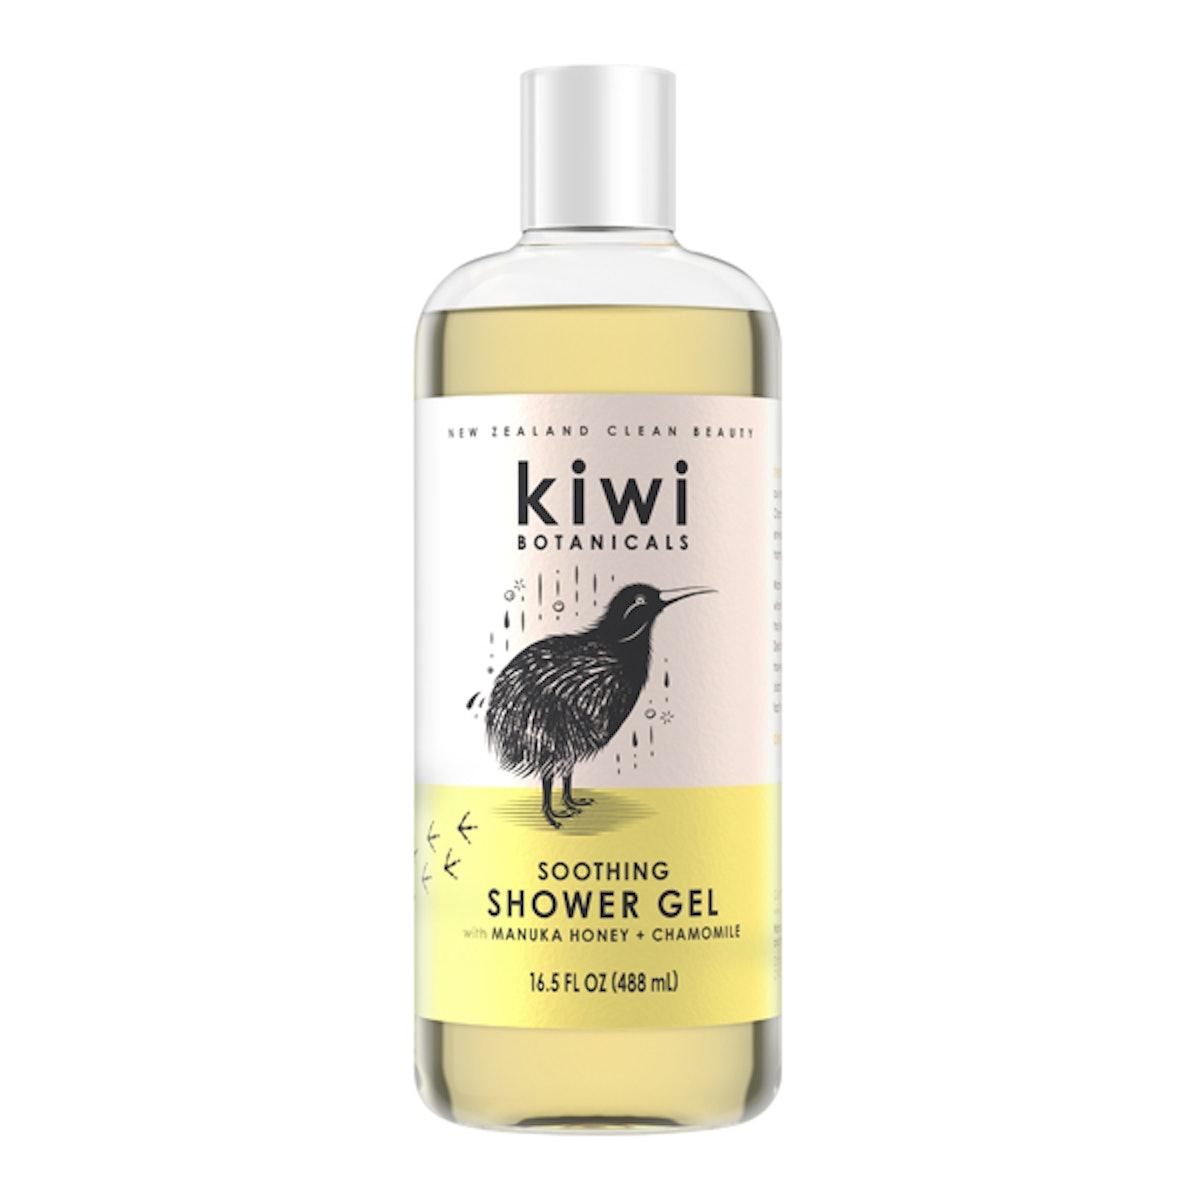 Soothing Shower Gel with Chamomile and Manuka Honey